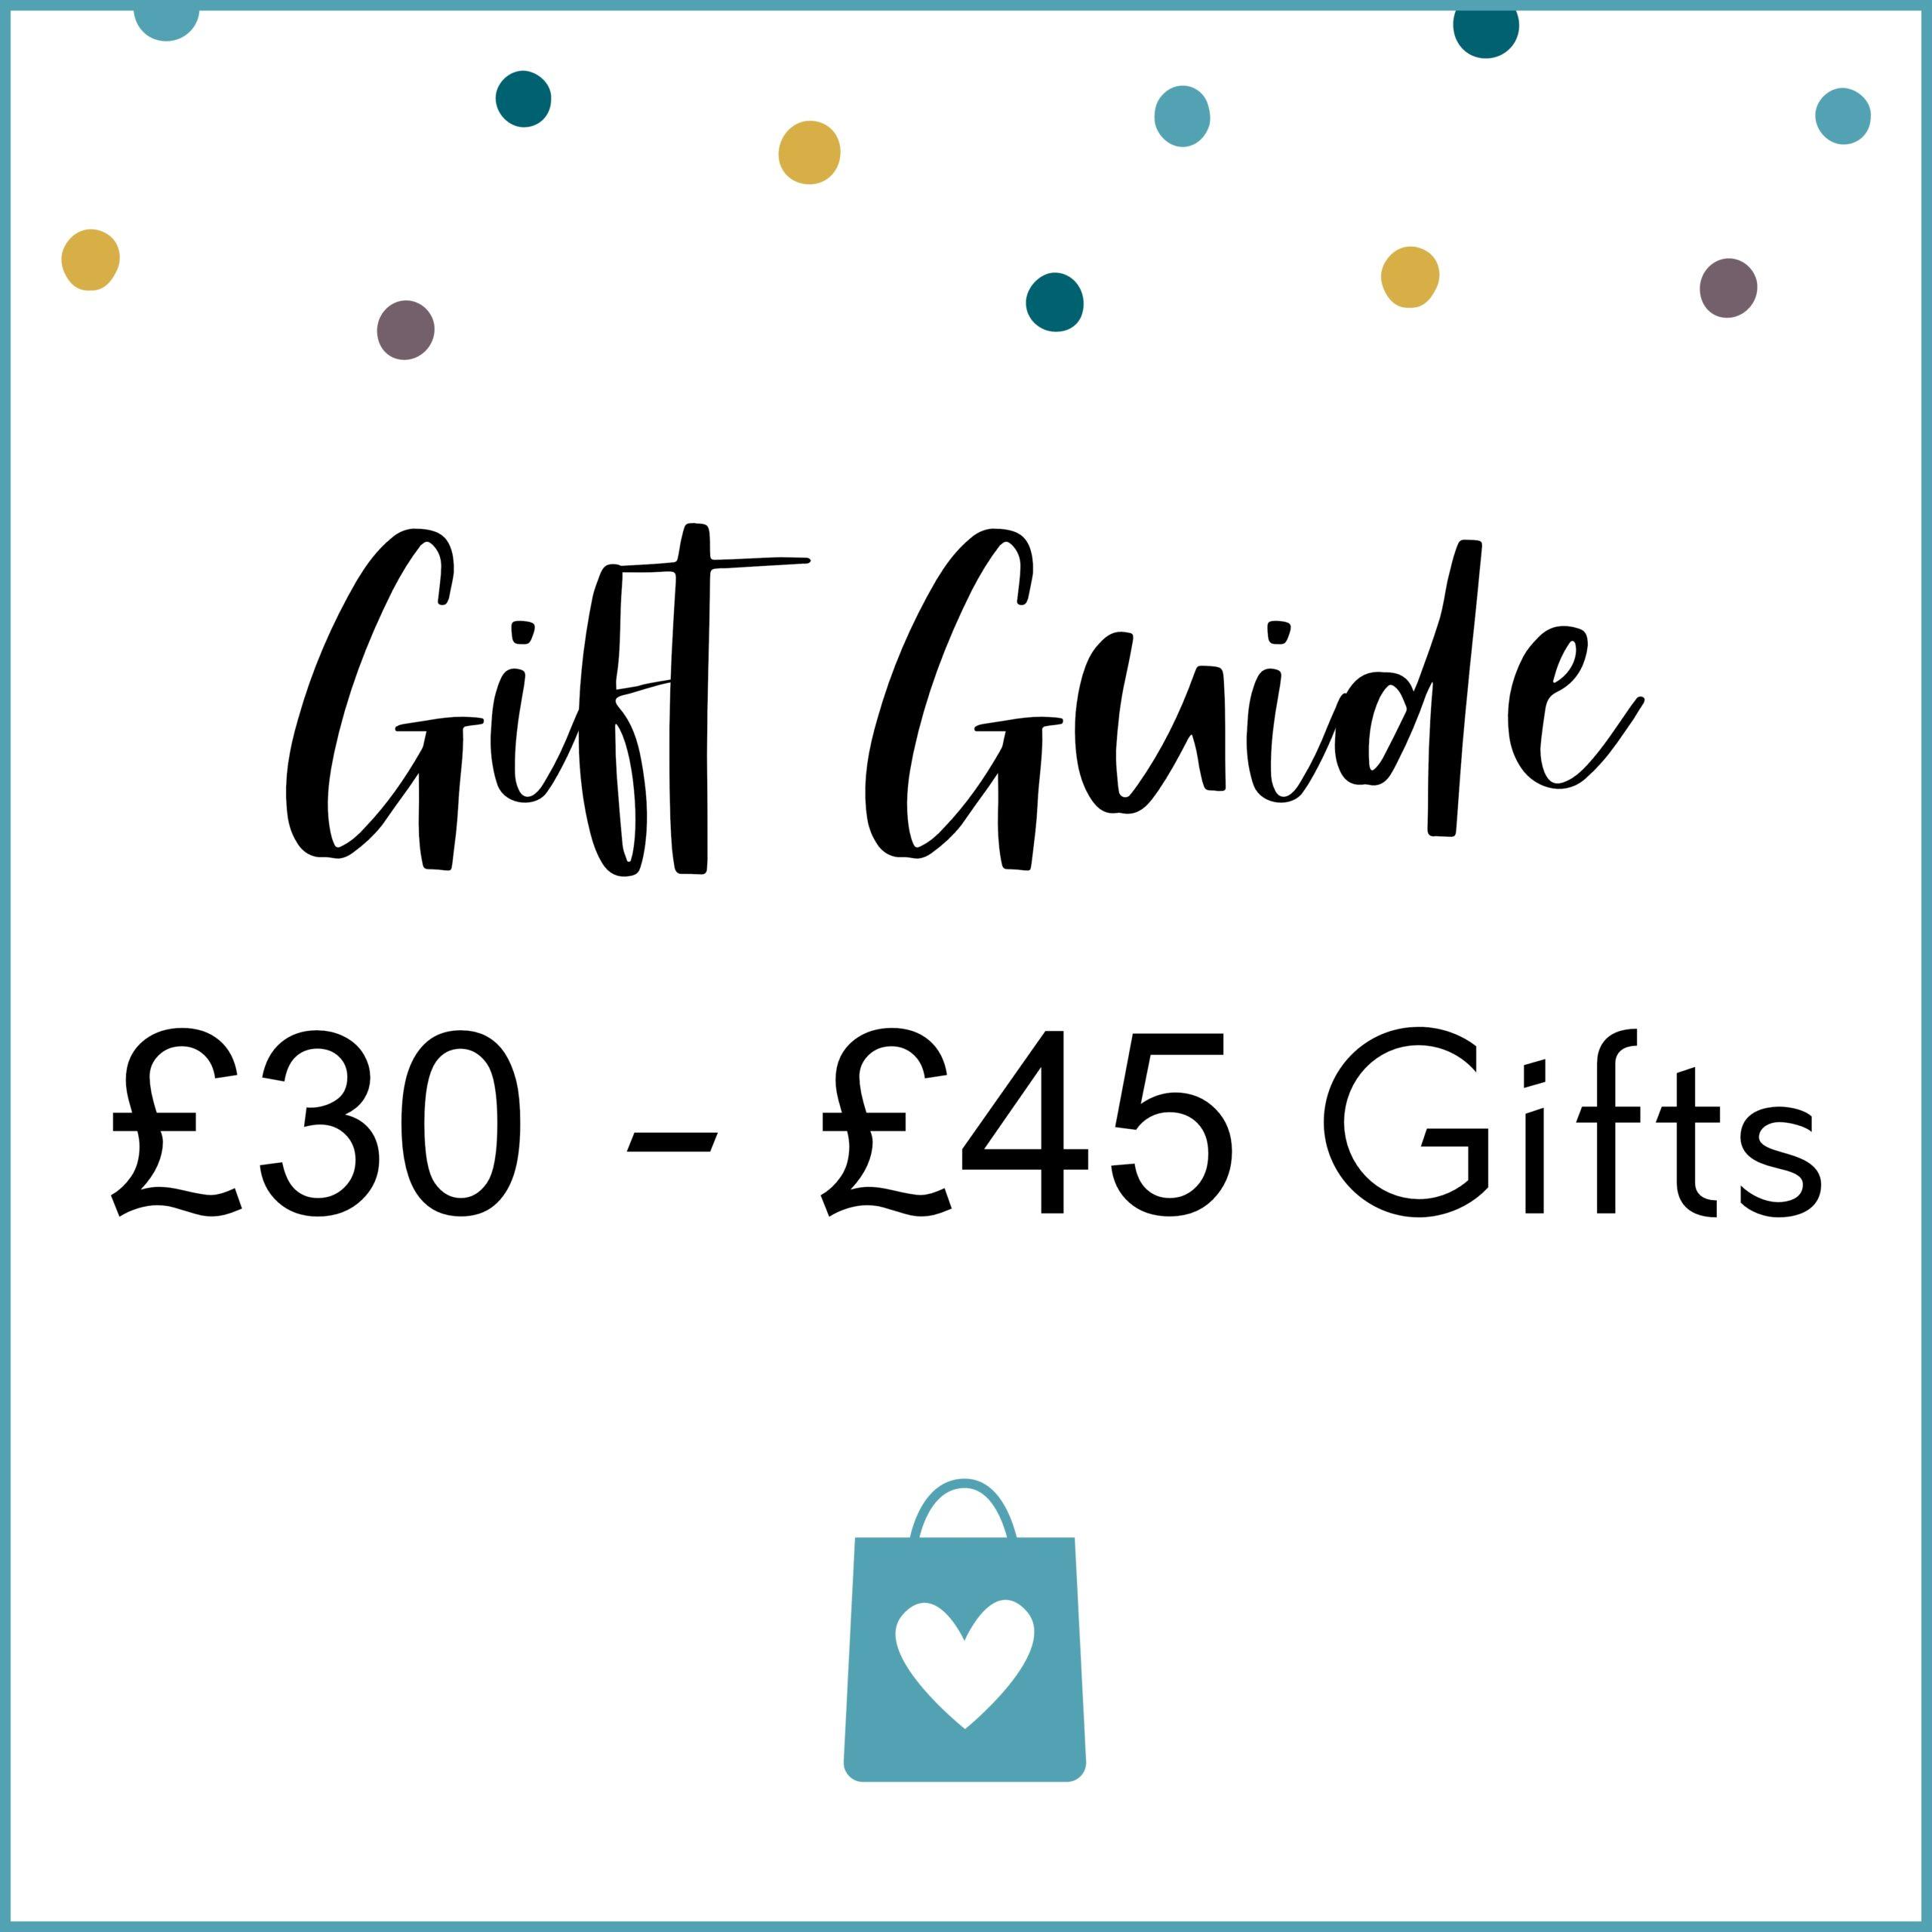 £30 - £45 Gift Guide